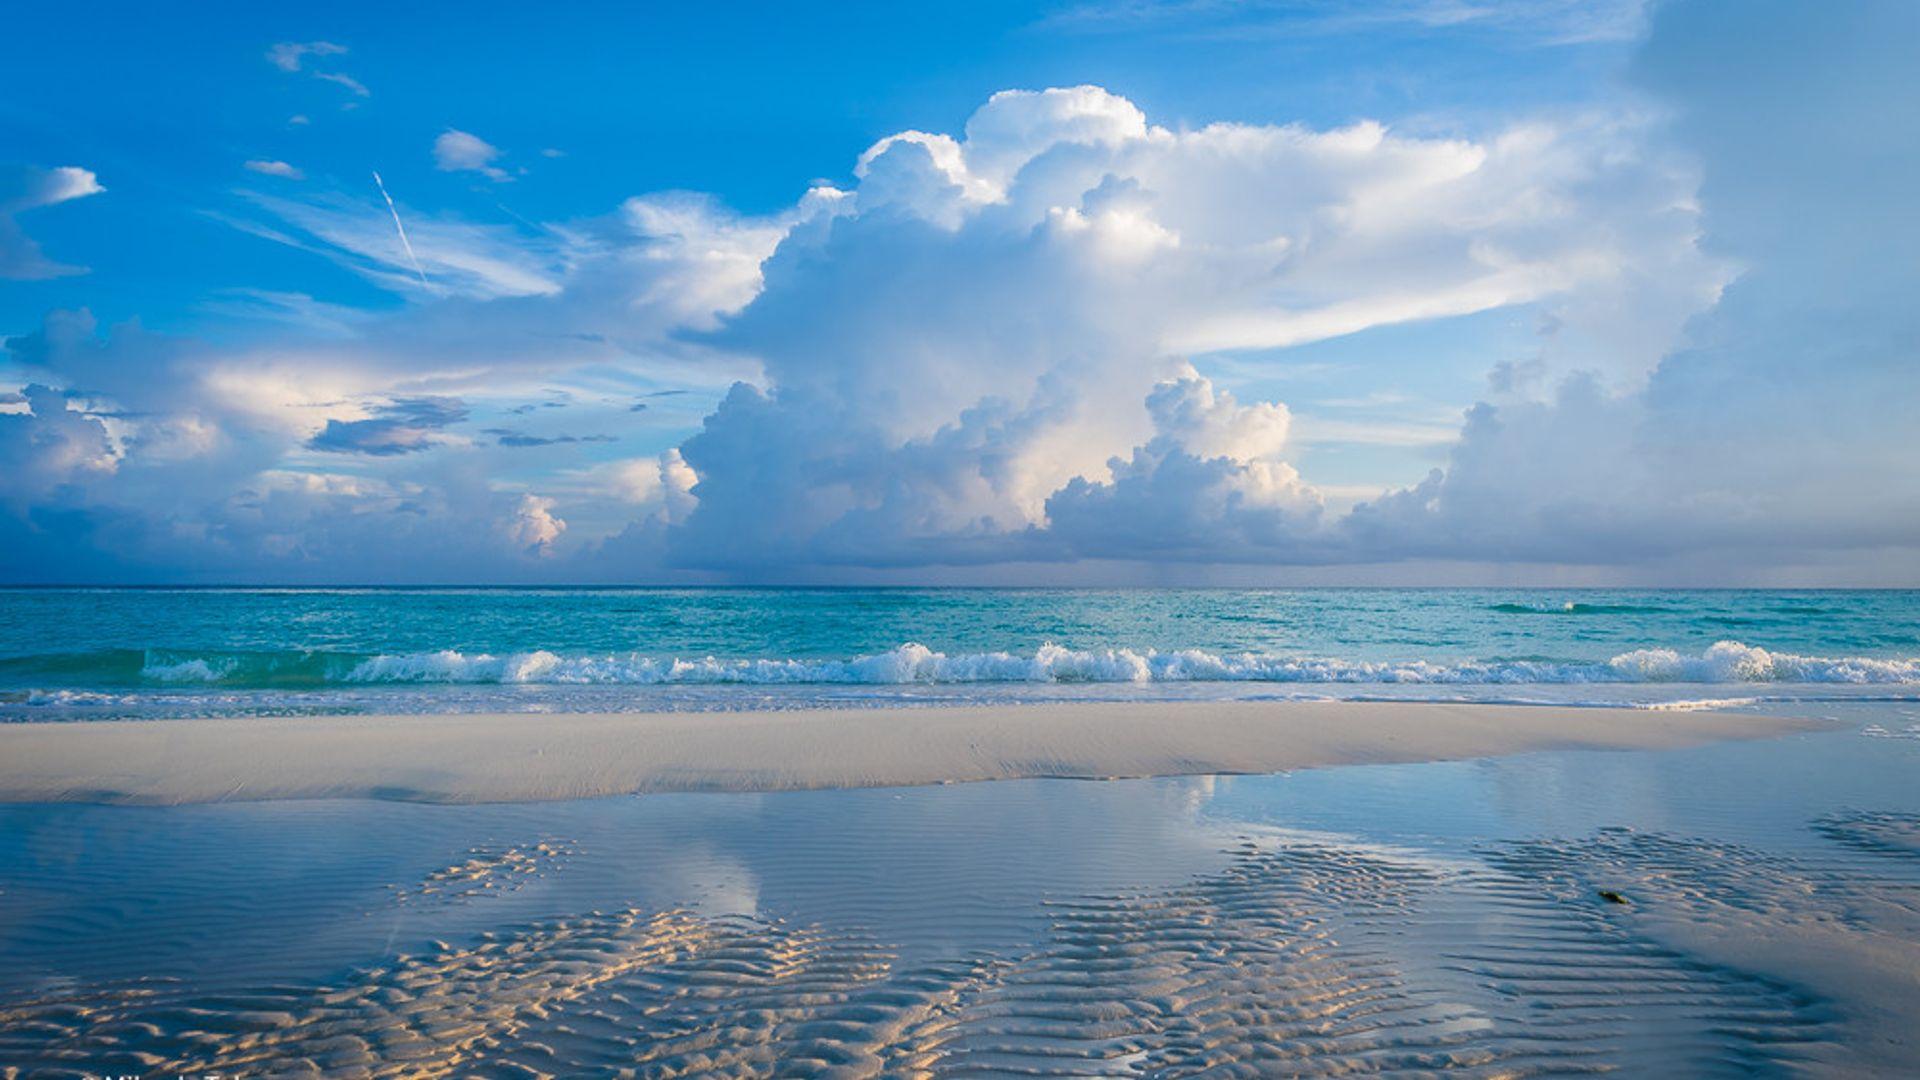 Sejur Havana & plaja Cayo Santa Maria, 11 zile - noiembrie 2021